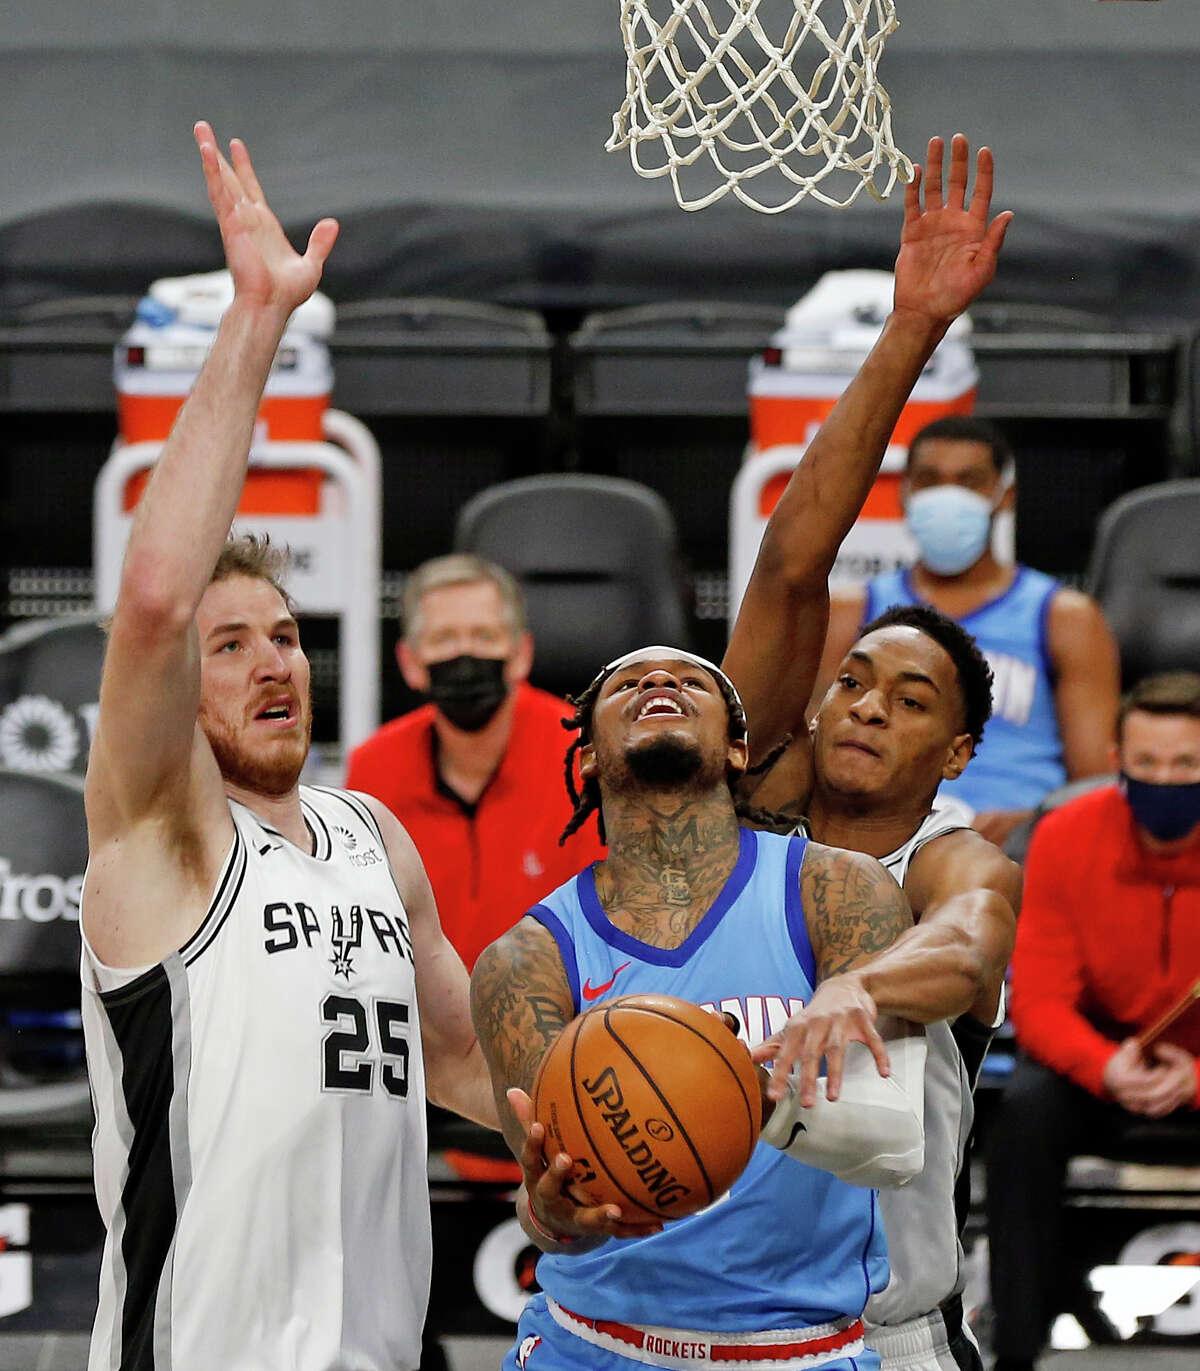 Jakob Poeltl #25 of the San Antonio Spurs and Devin Vassell #24 block shot of Ben McLemore #16 of the Houston Rockets. Rockets v Spurs at AT&T Center on Saturday, Jan. 16, 2021